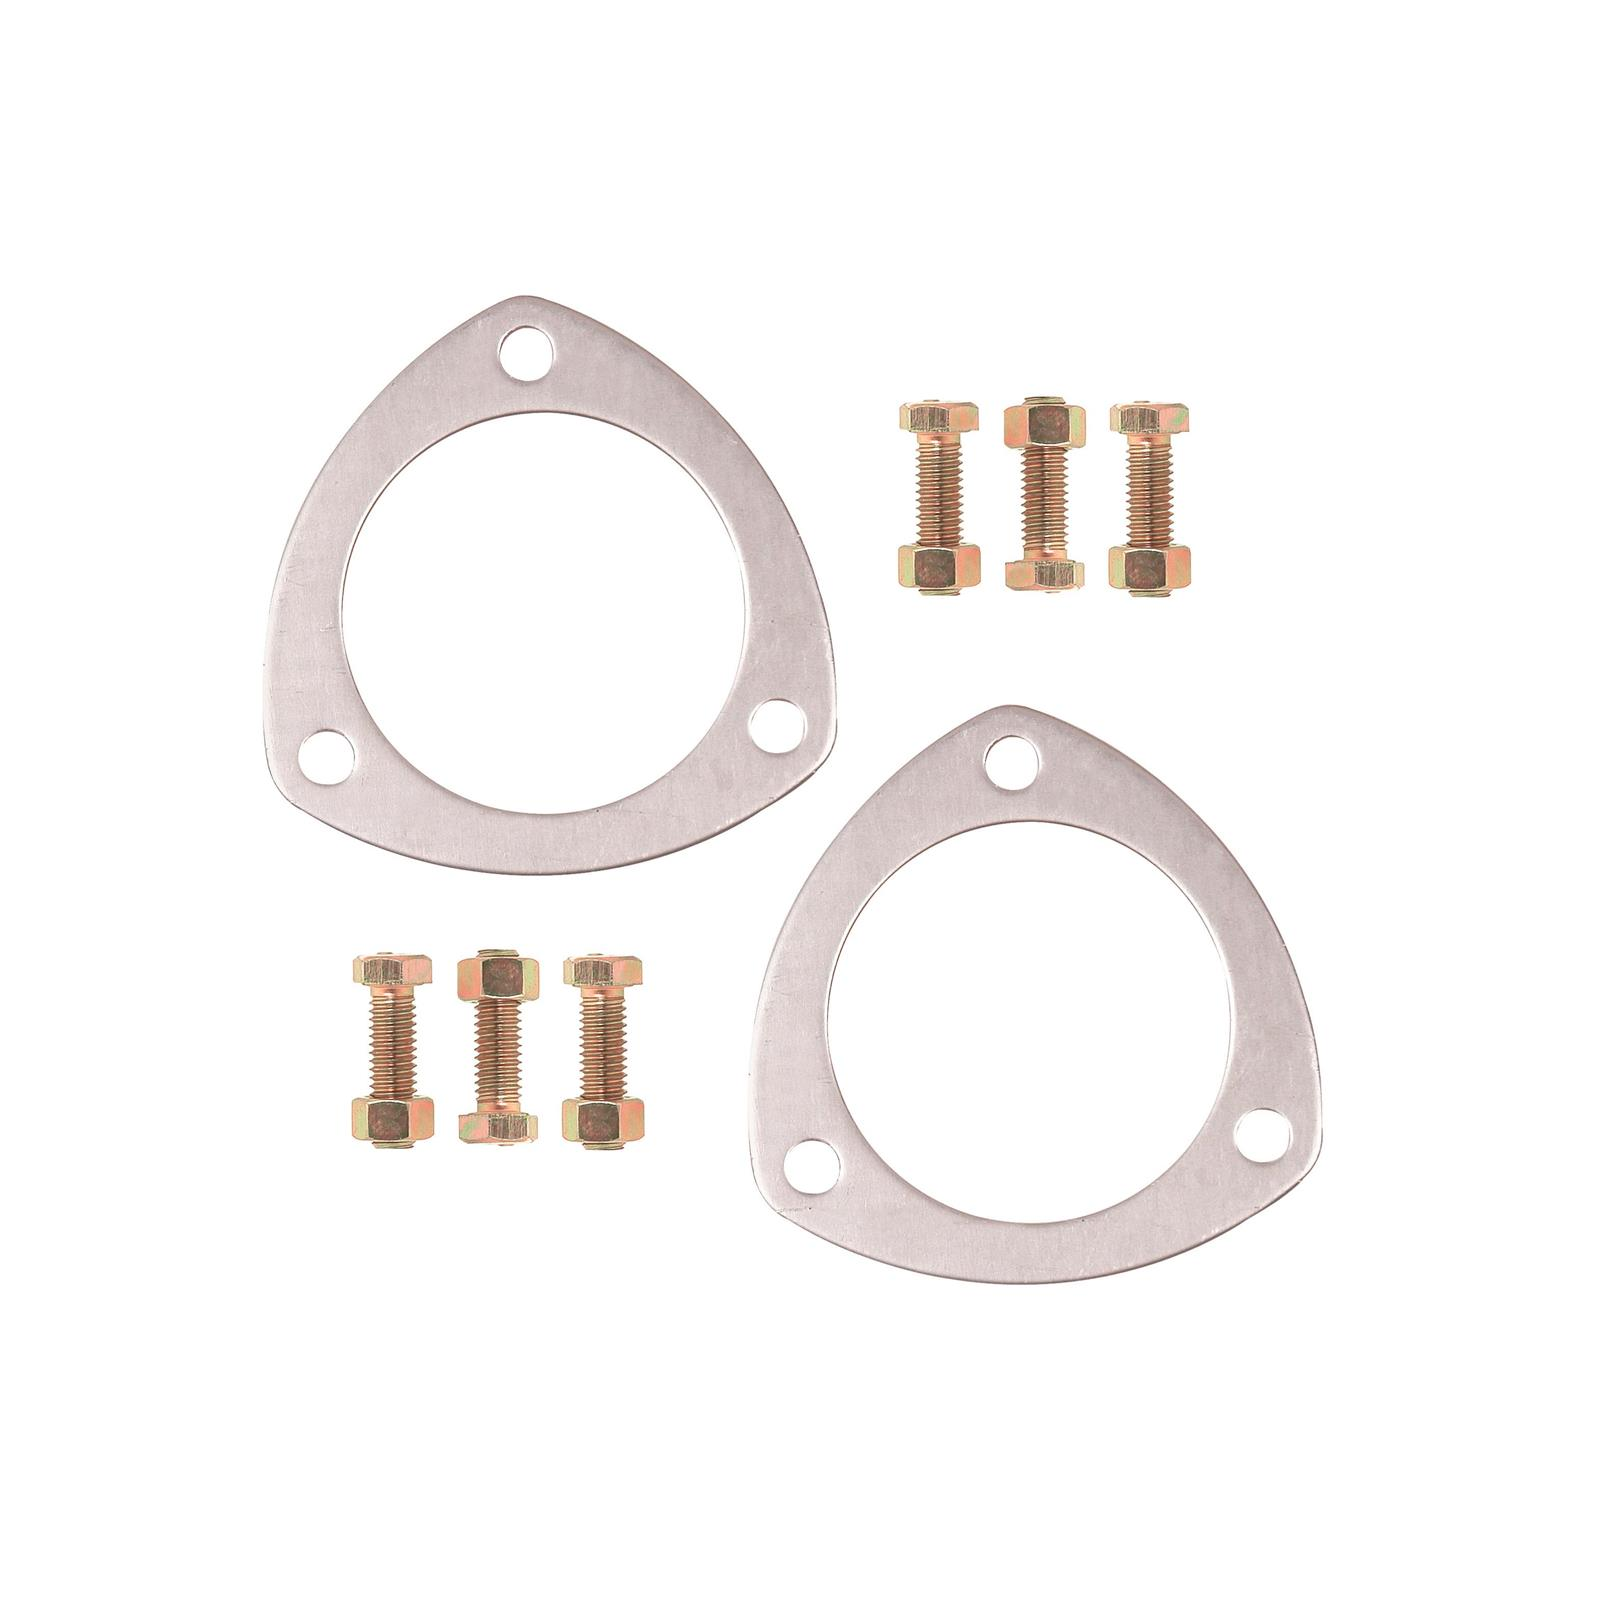 Gasket 7177C Copper Seal Collector Gasket Mr